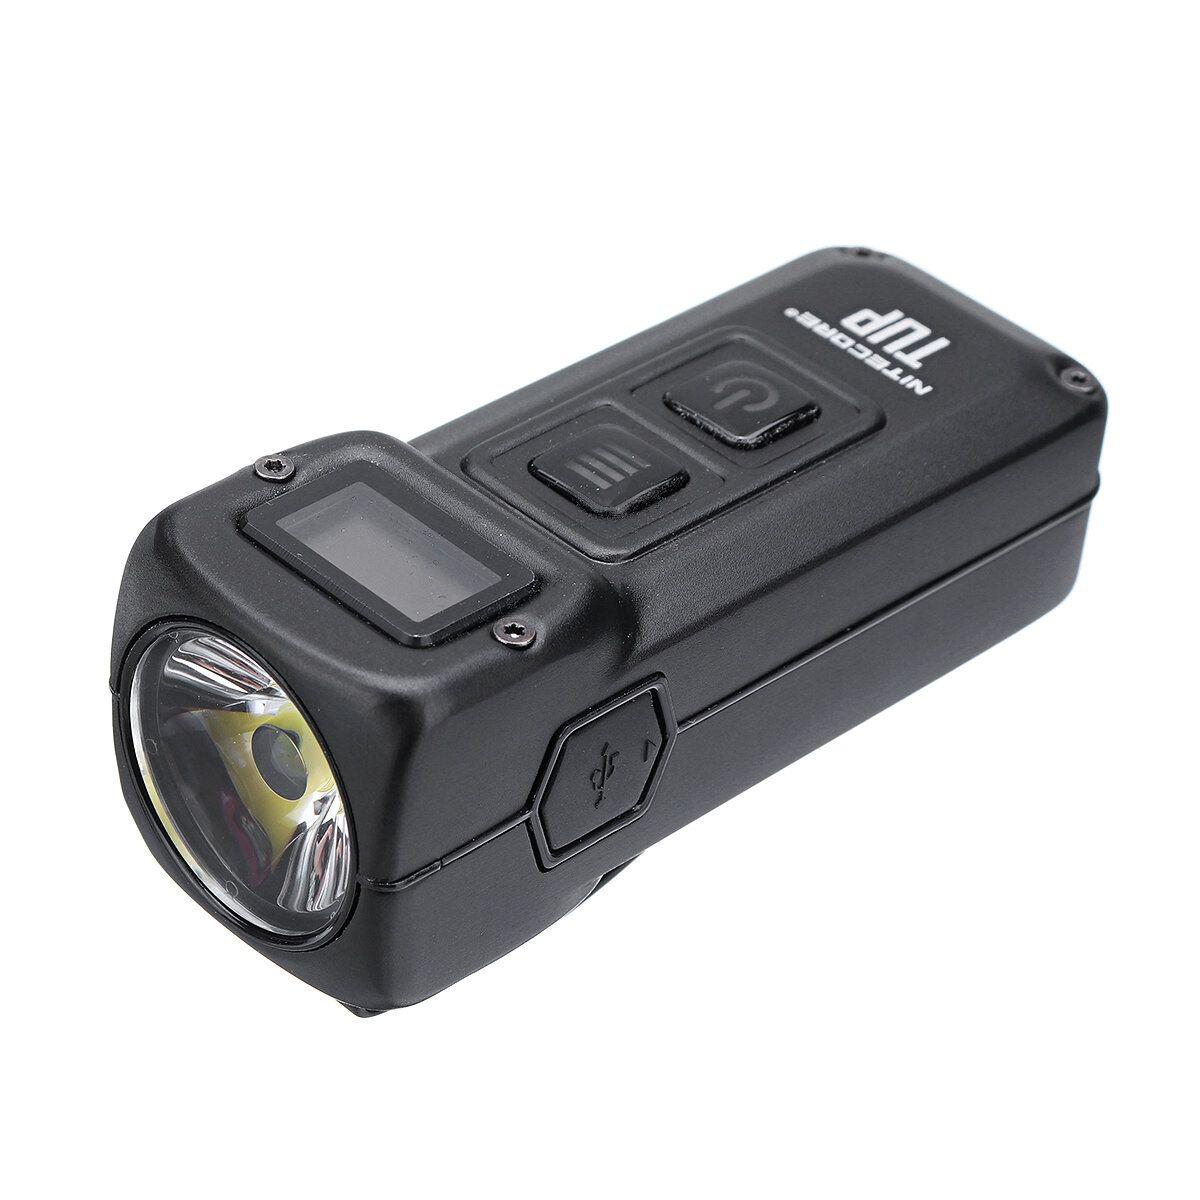 NITECORE TUP XP L HD V6 1000LM Rechargeable LED Keychain Light OLED Display Intelligent EDC Pocket Flashlight